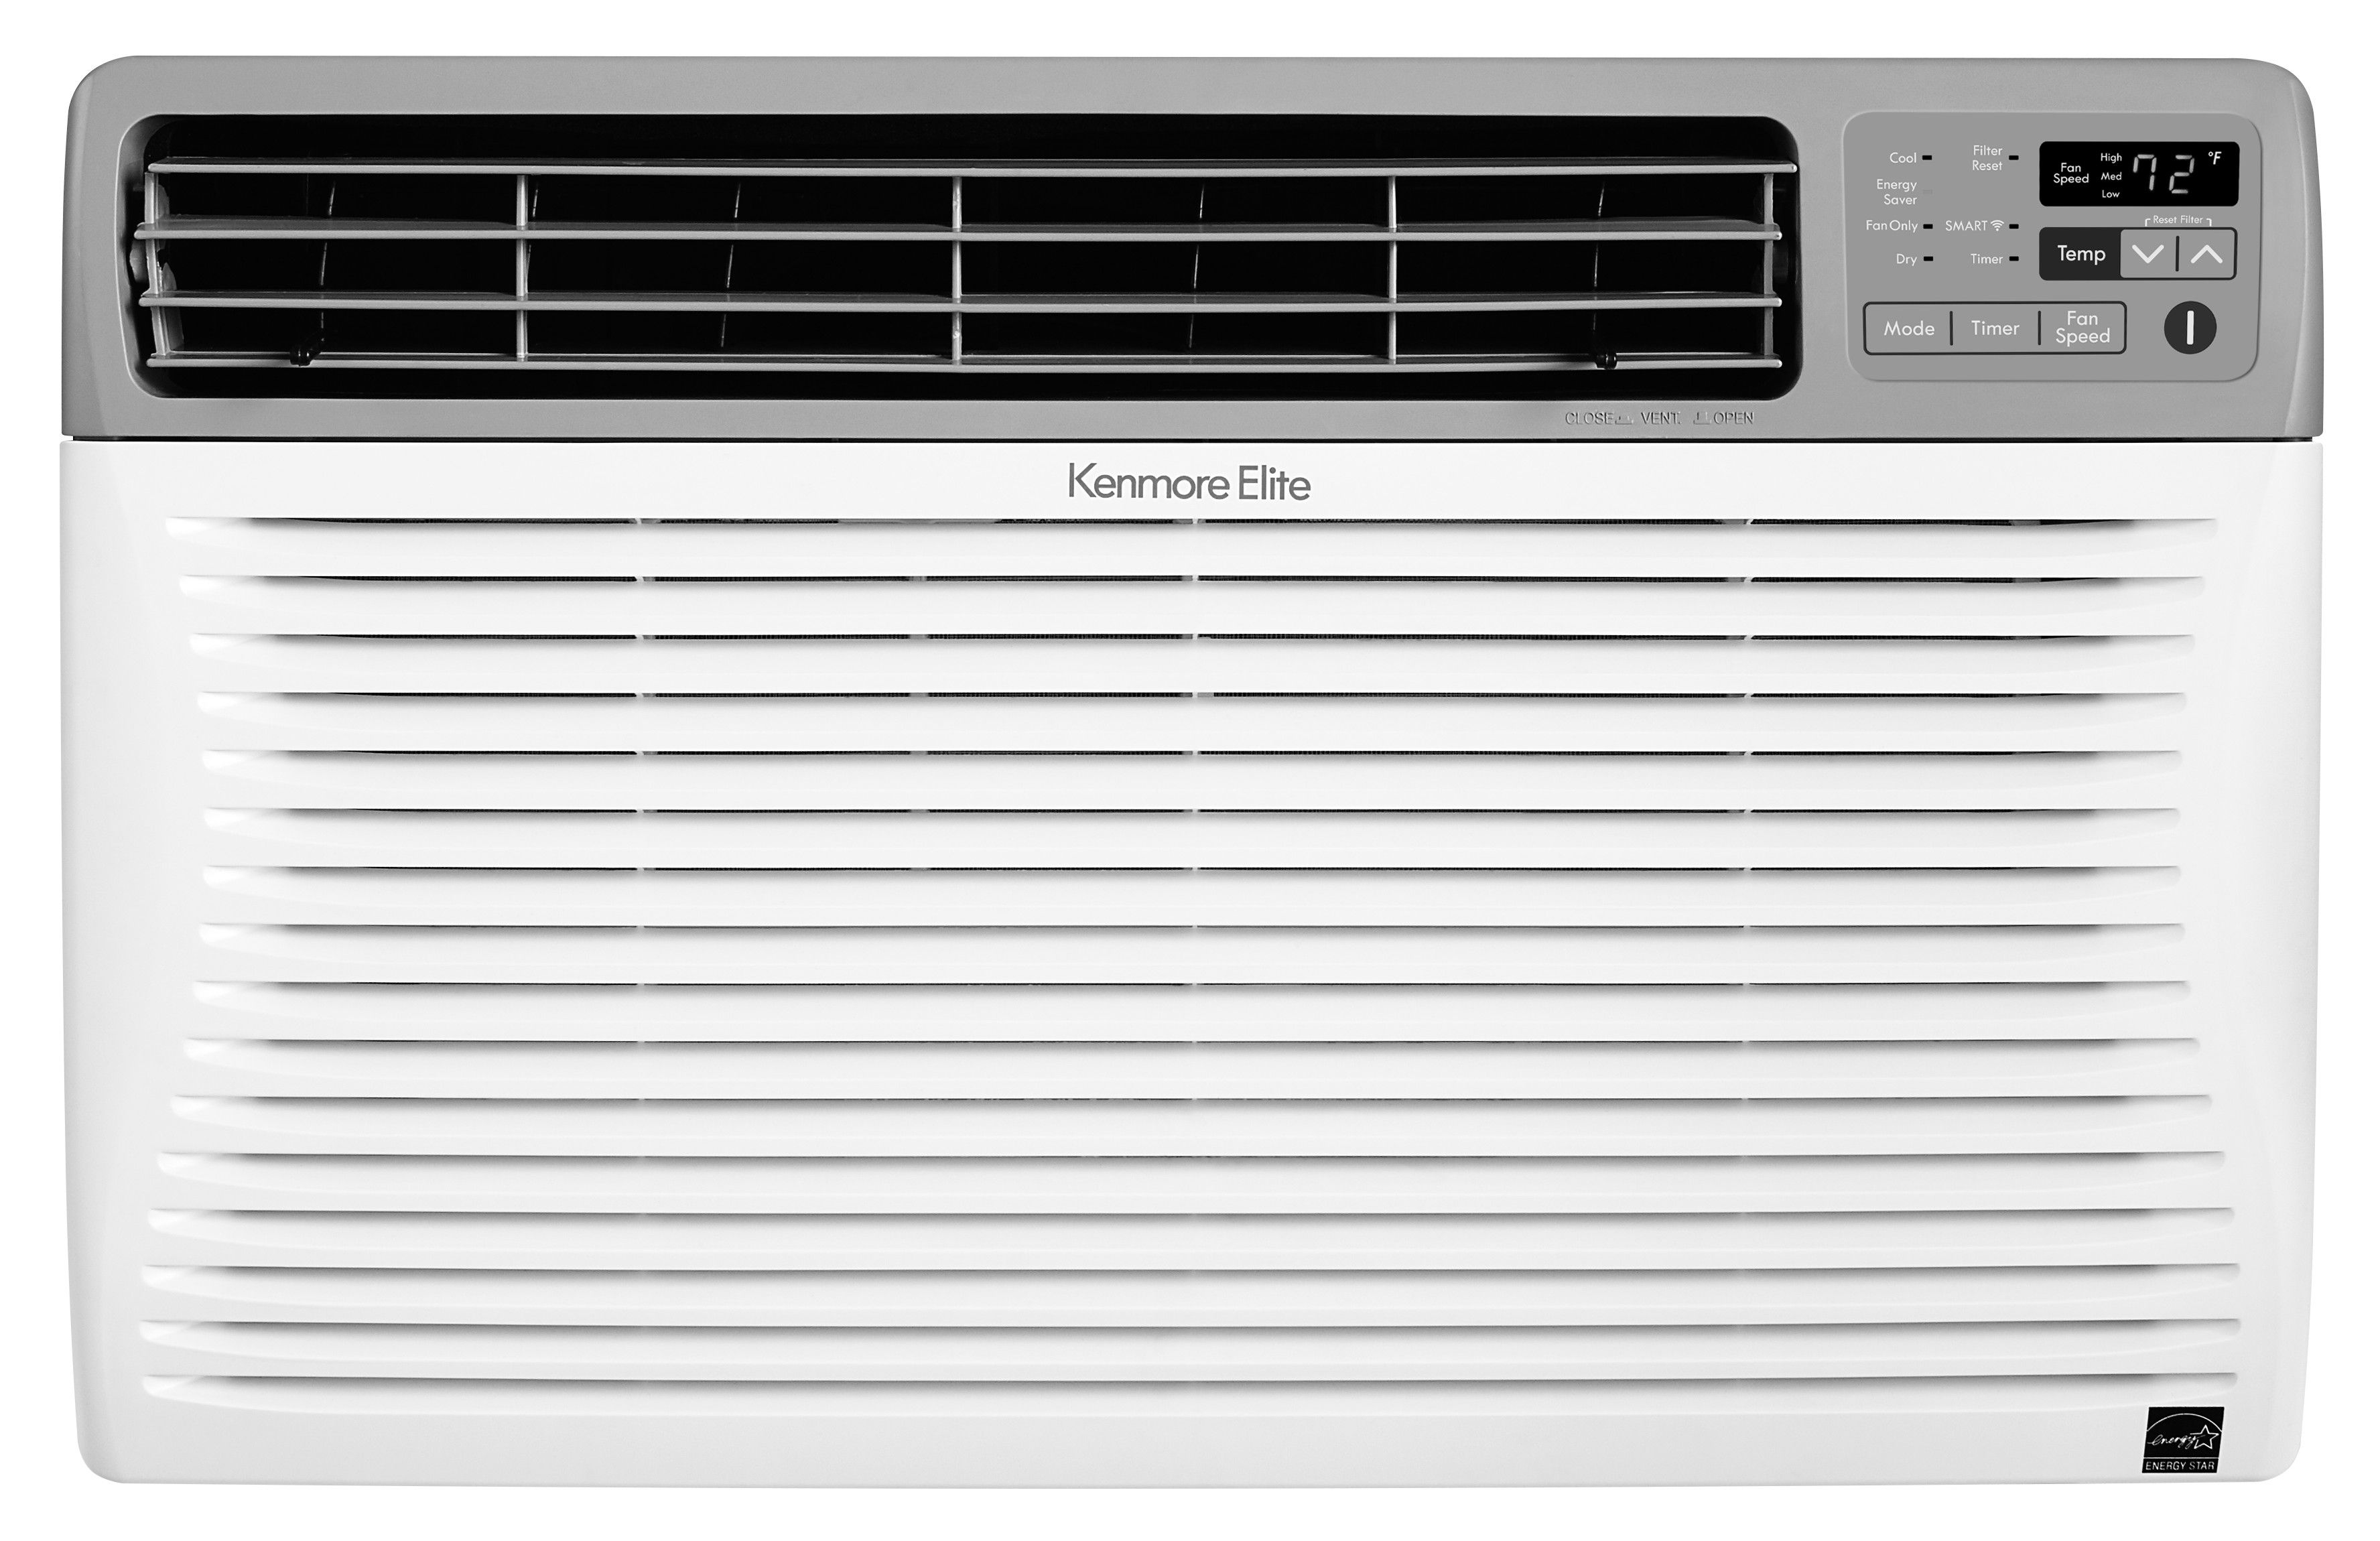 Kenmore Elite 77127 12,000 BTU Smart Room Air Conditioner